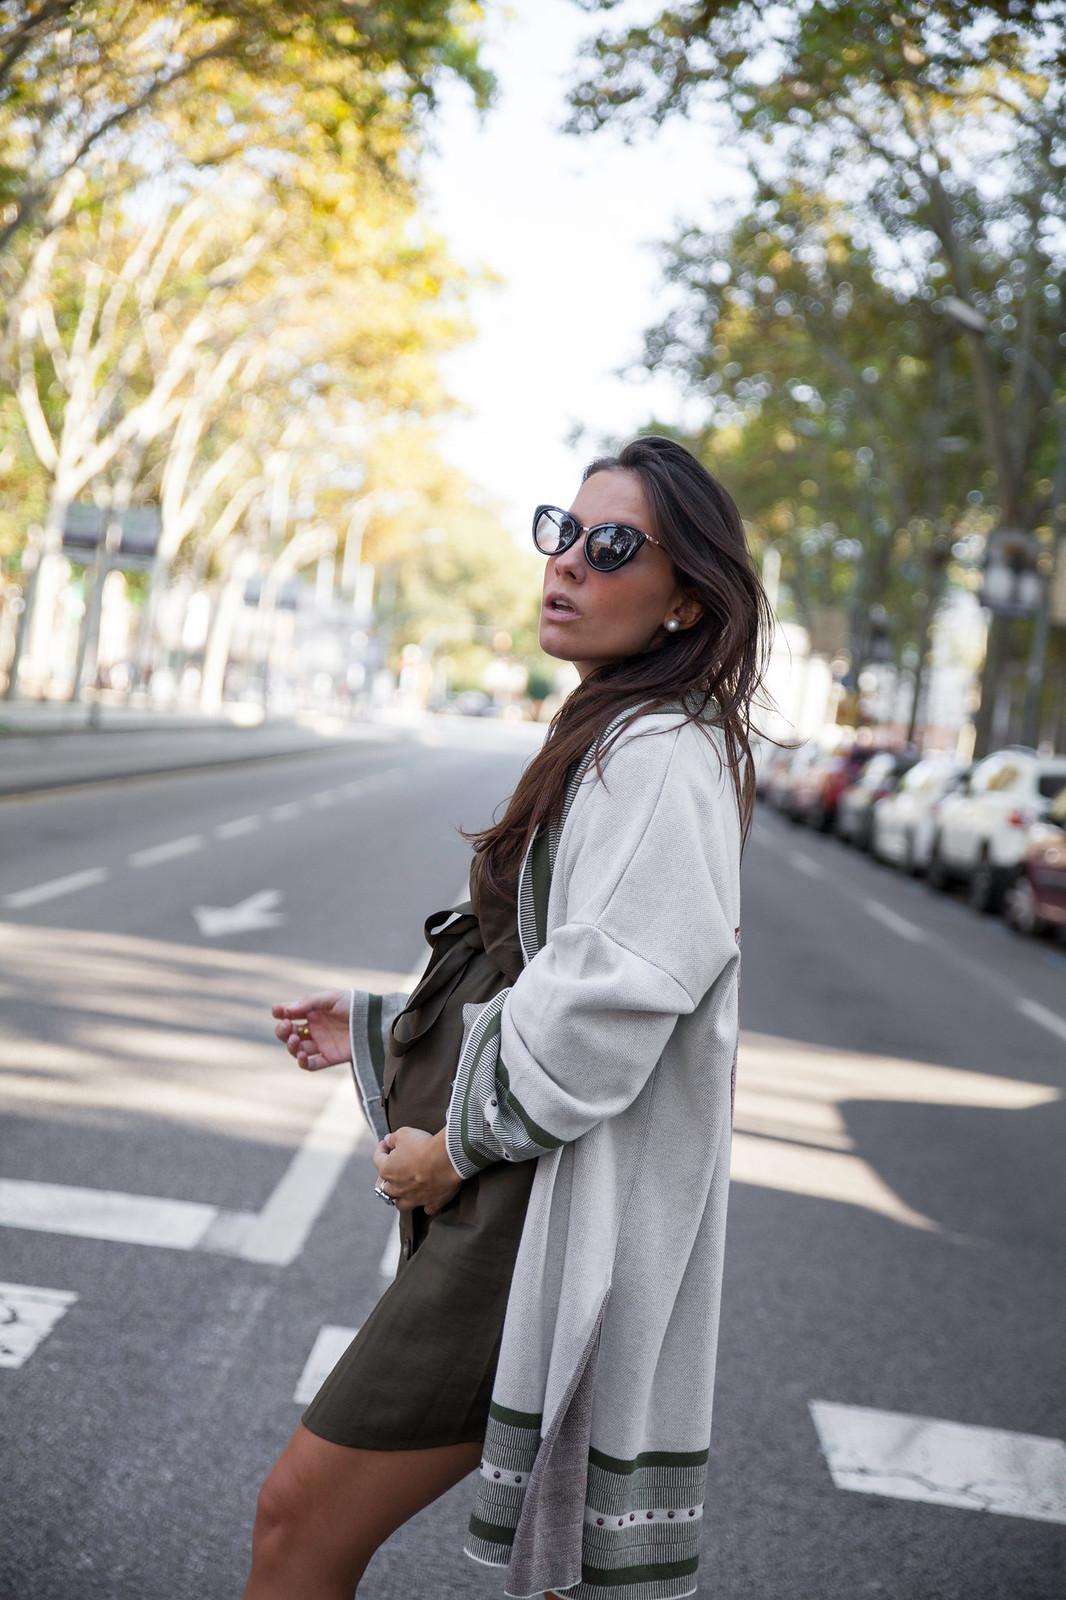 08_Como_combinar_un_cardigan_khaki_etnico_otoño_theguestgirl_rüga_laura_santolaira_influencer_embarazada_fashion_street_style_barcelona